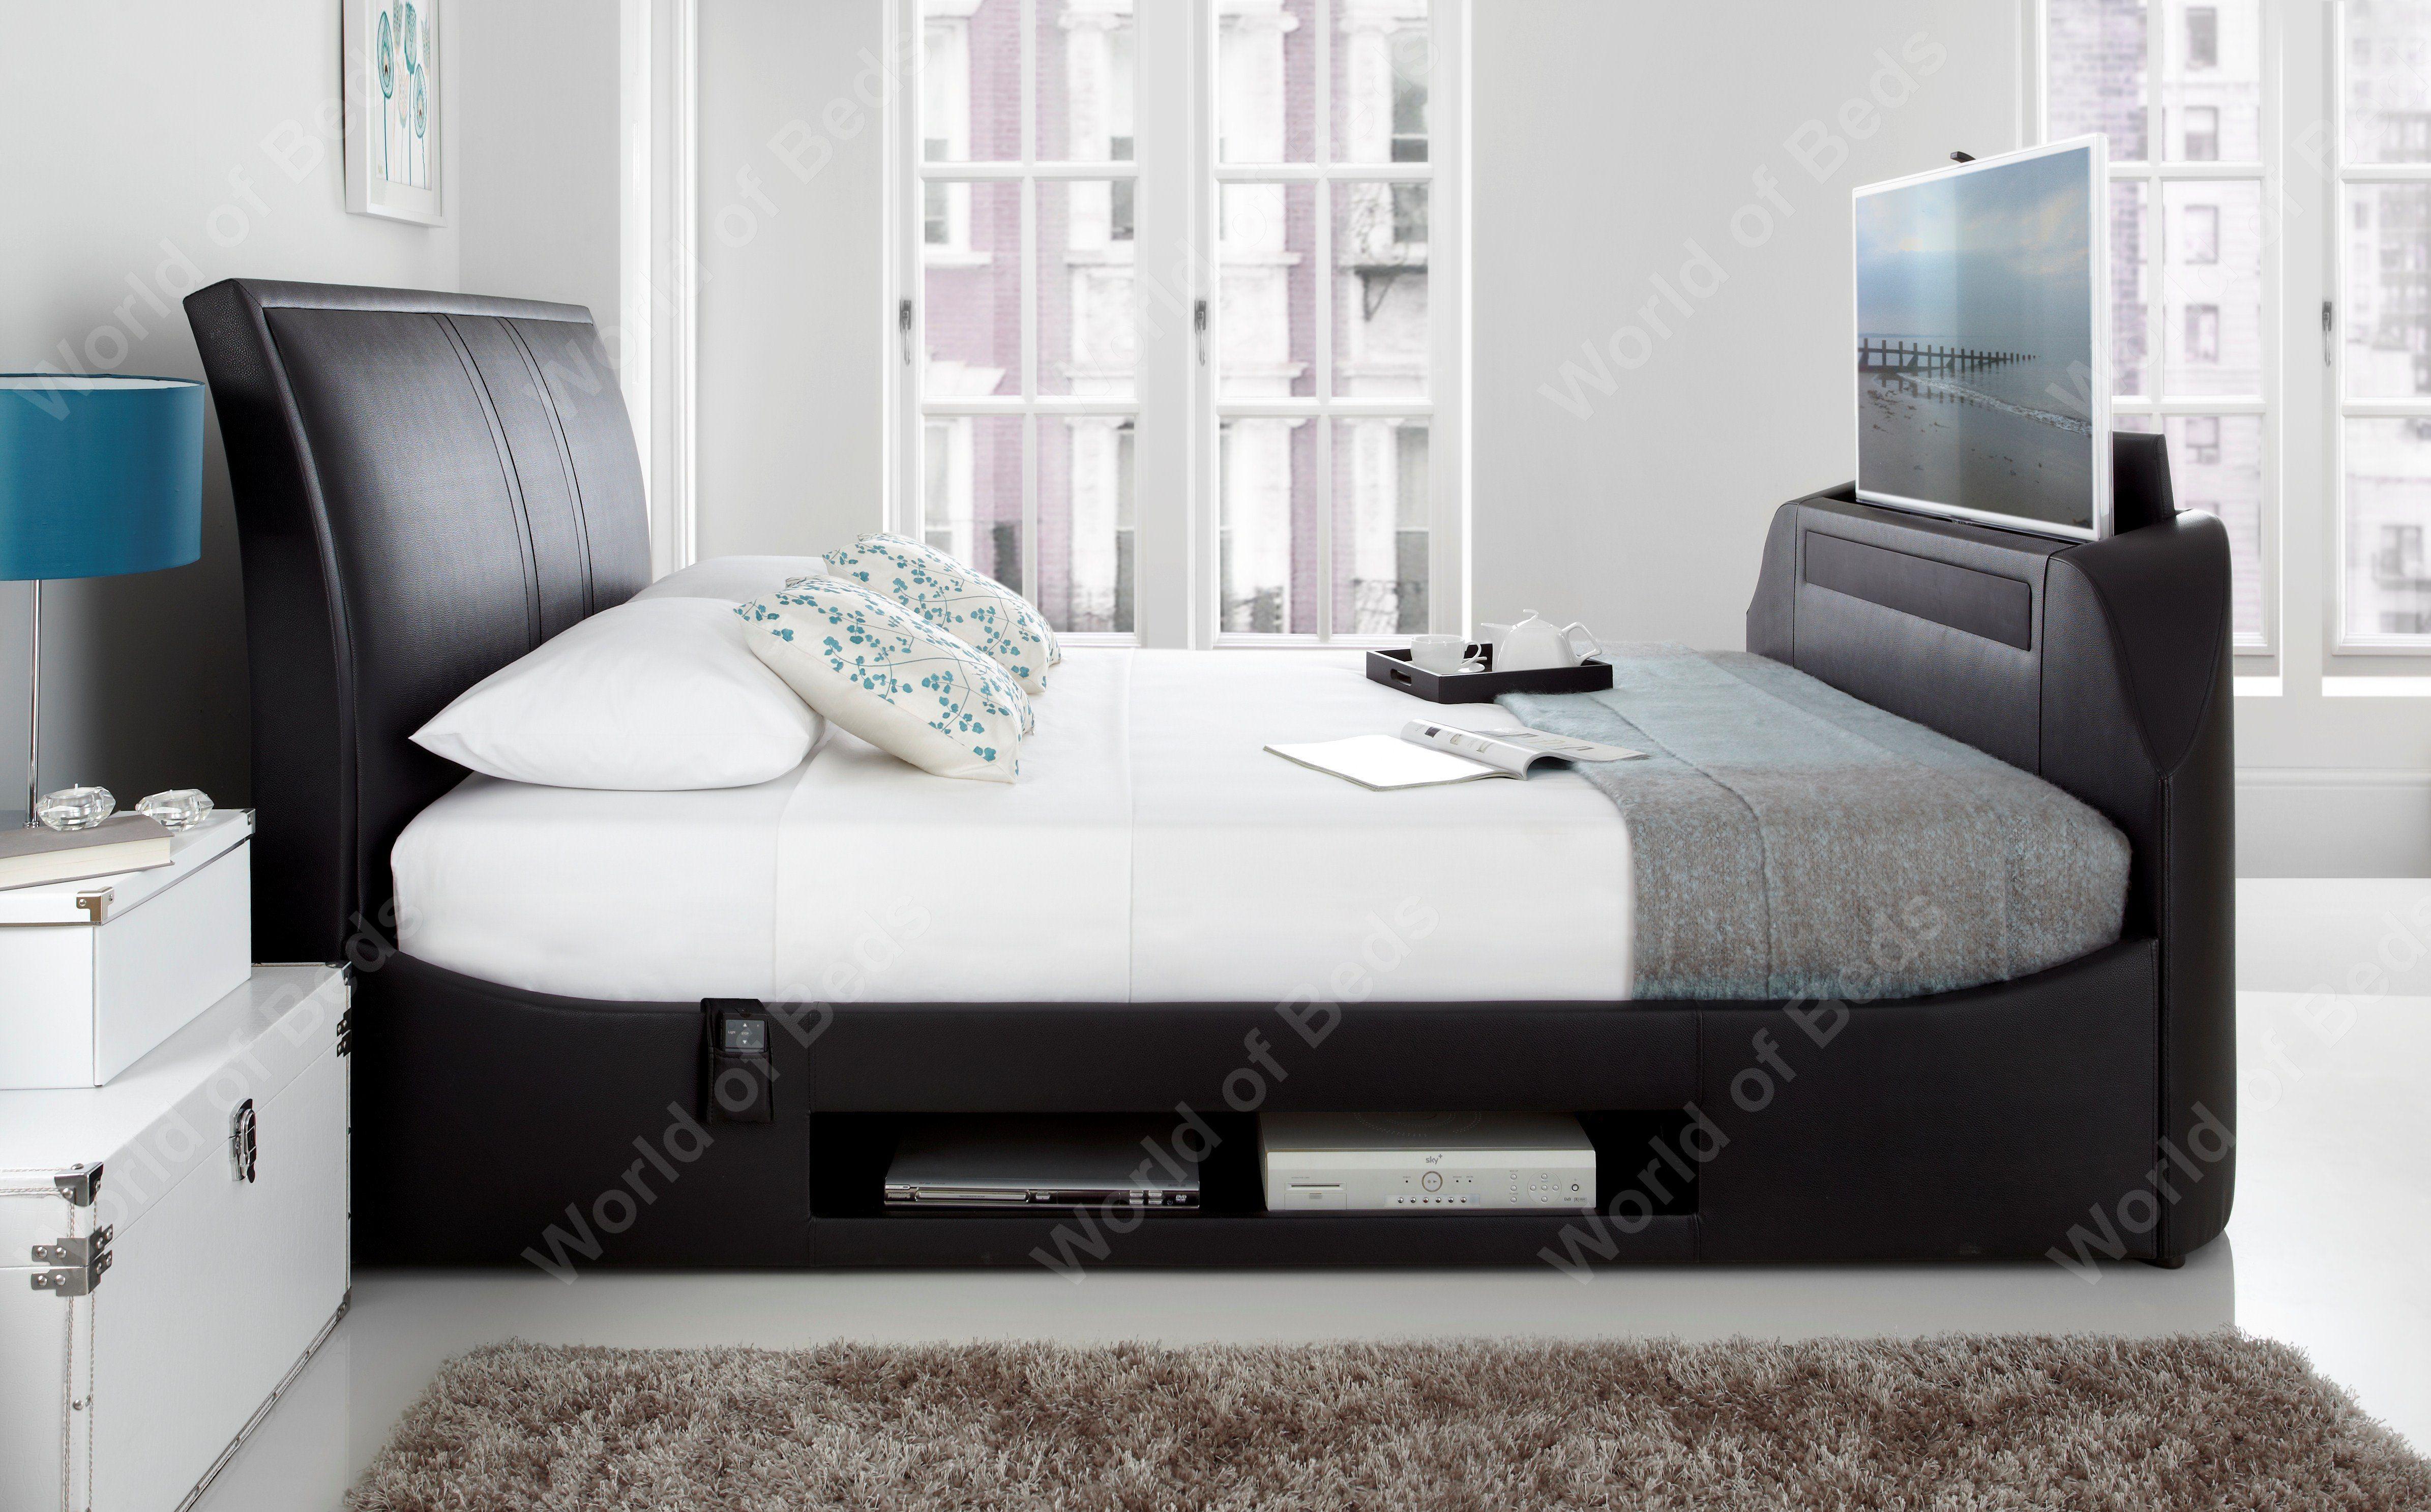 Kaydian Maximus TV Bed & Sound Bar #TV #Beds #Bedroom | TV Beds ...